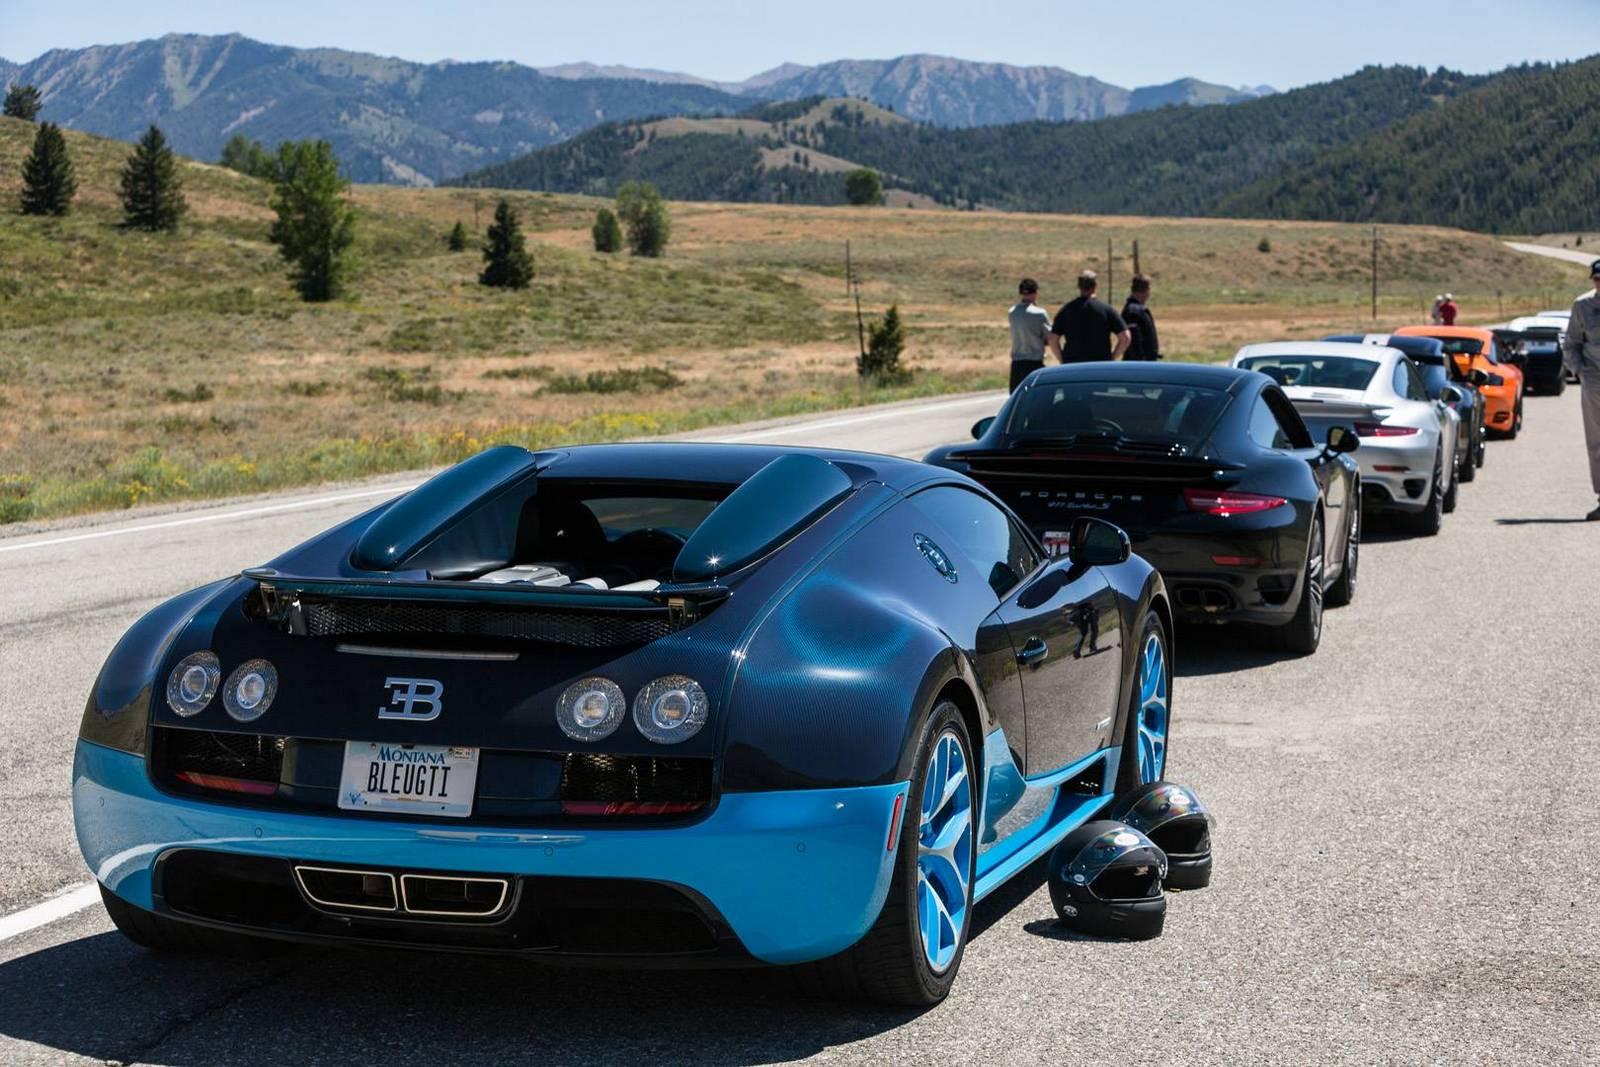 Фото | Синий Bugatti Veyron. 2014 год